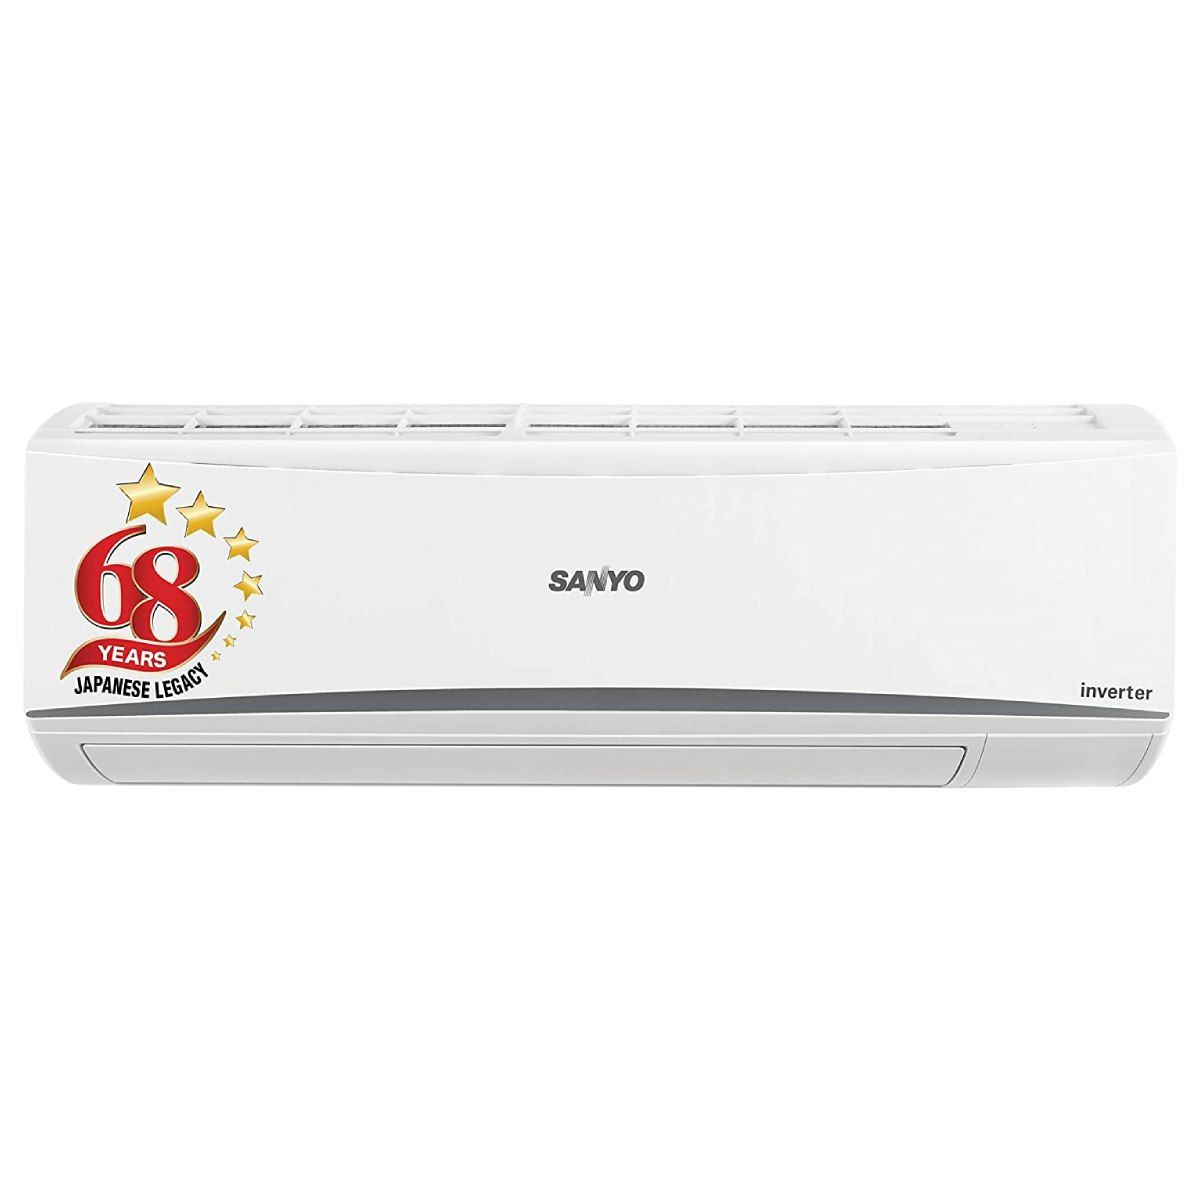 Sanyo 1 Ton 3 Star Inverter Split ಏರ್ ಕಂಡೀಷನರ್ಗಳು (2020,SI/SO-10T3SCIC)